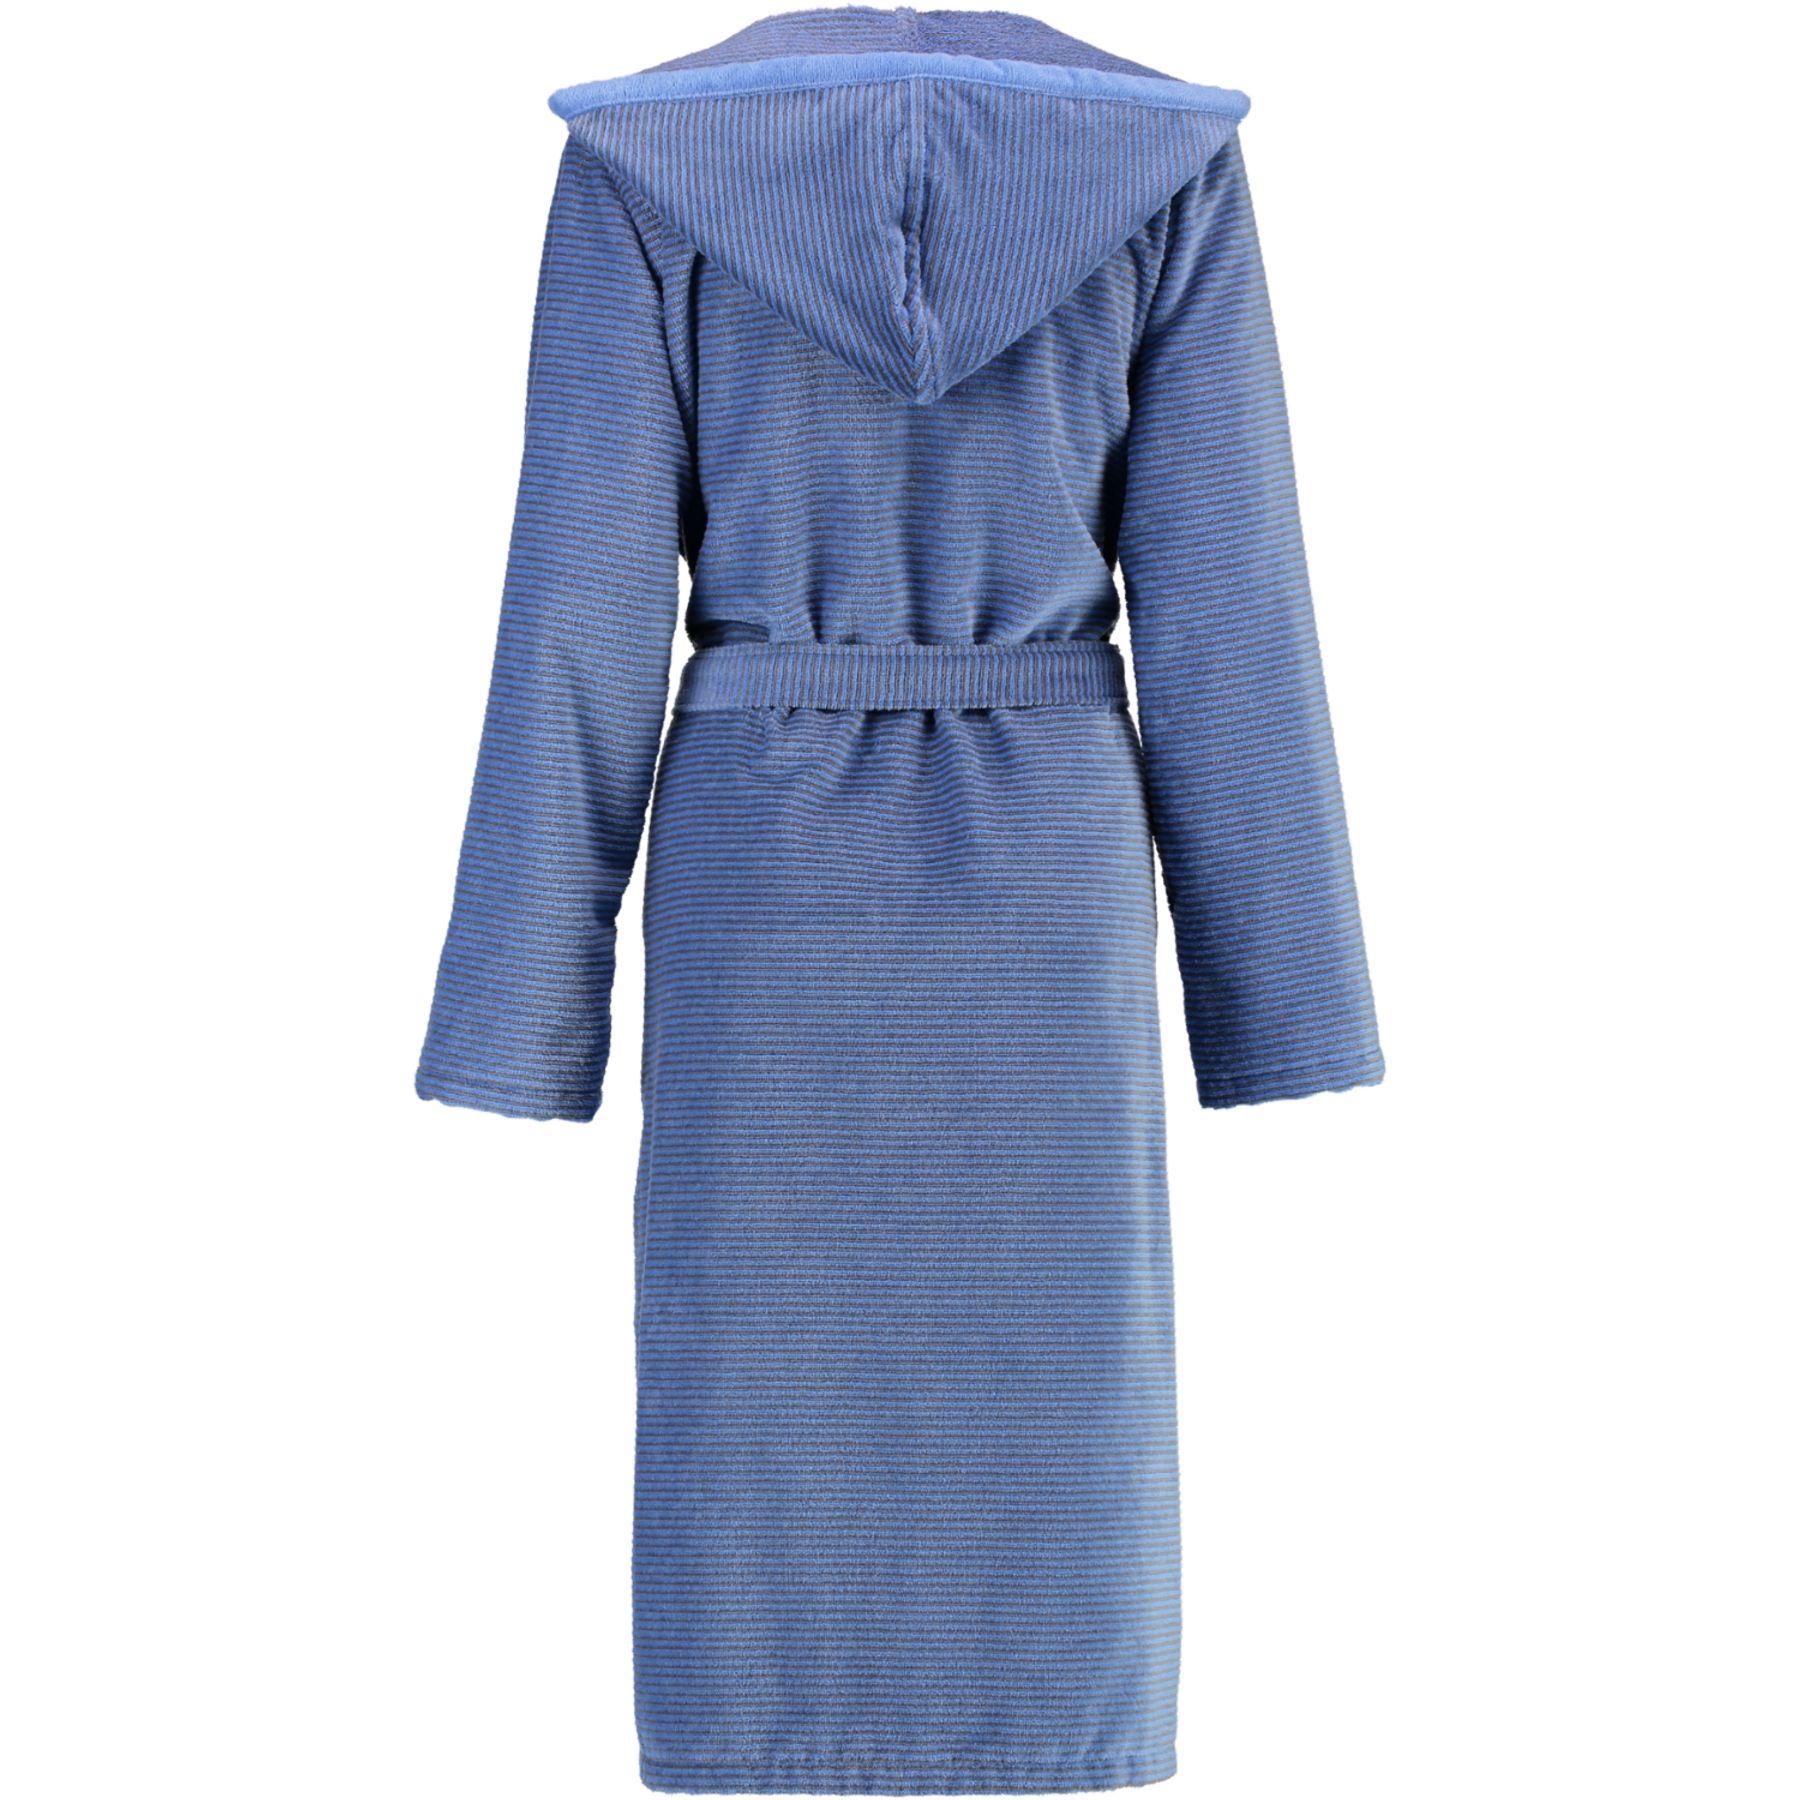 Cawö - Damen Mantel mit Kapuze (6432) – Bild 11